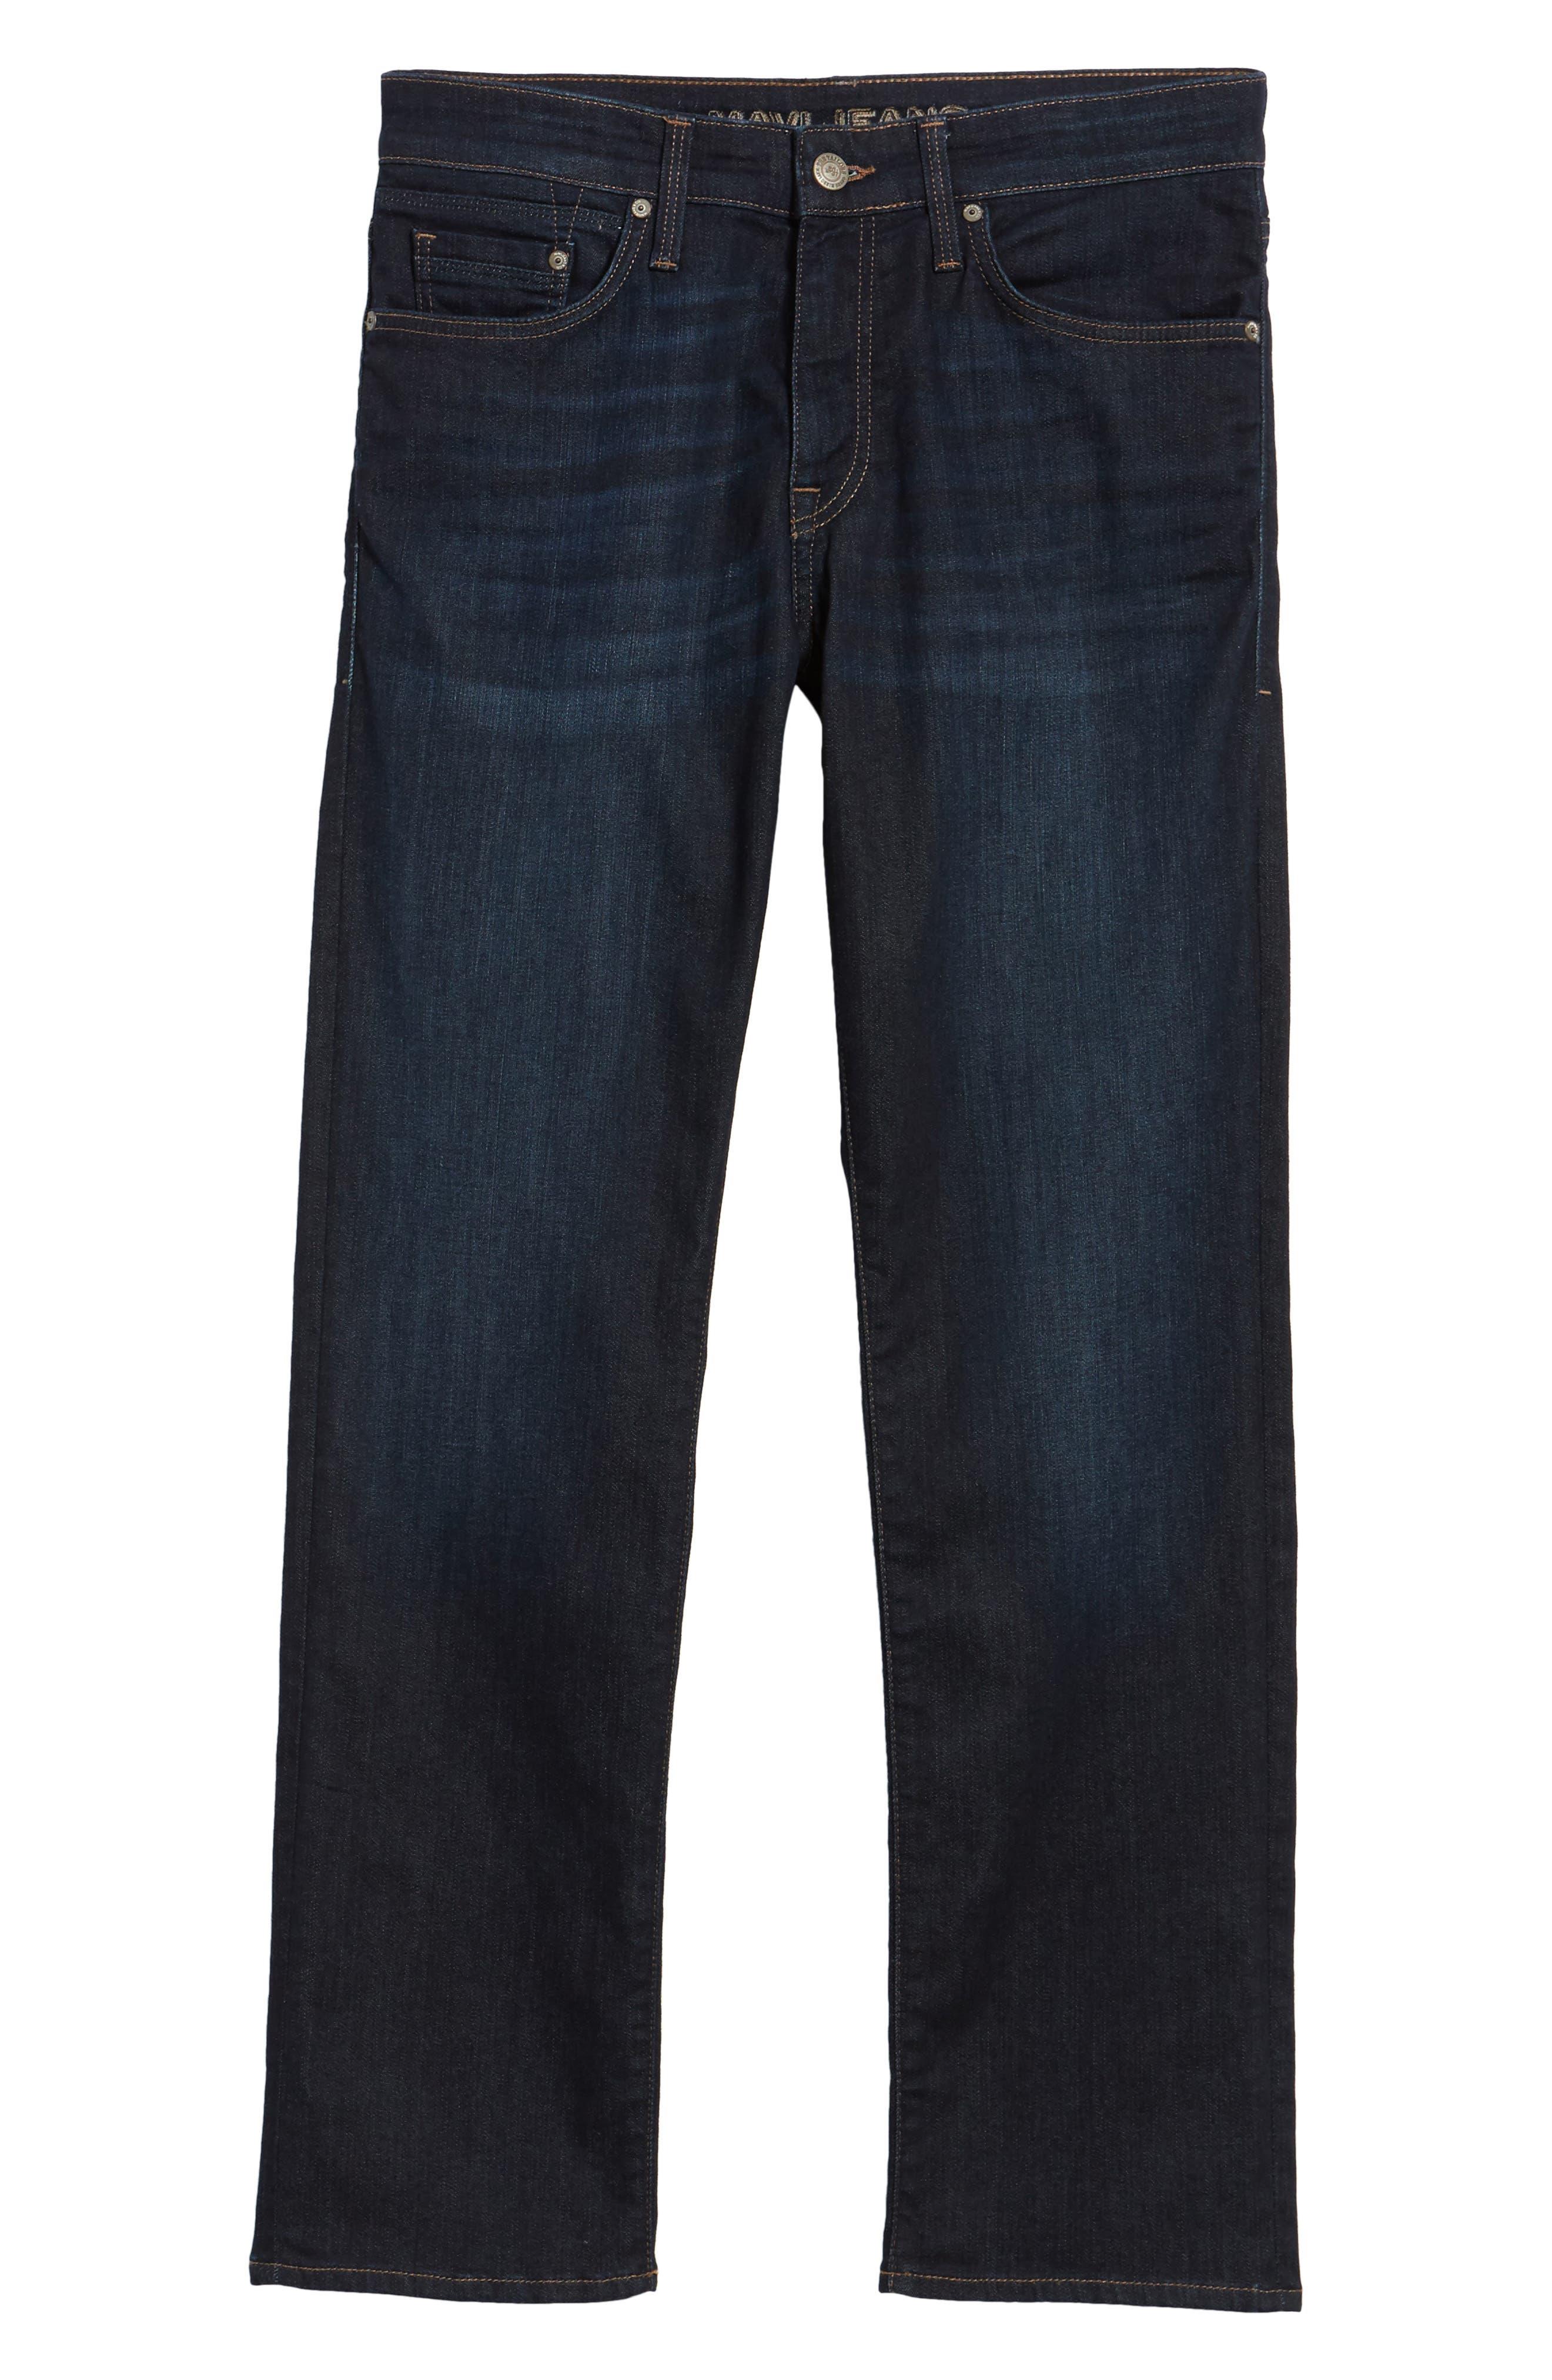 Matt Relaxed Fit Jeans,                             Alternate thumbnail 6, color,                             401